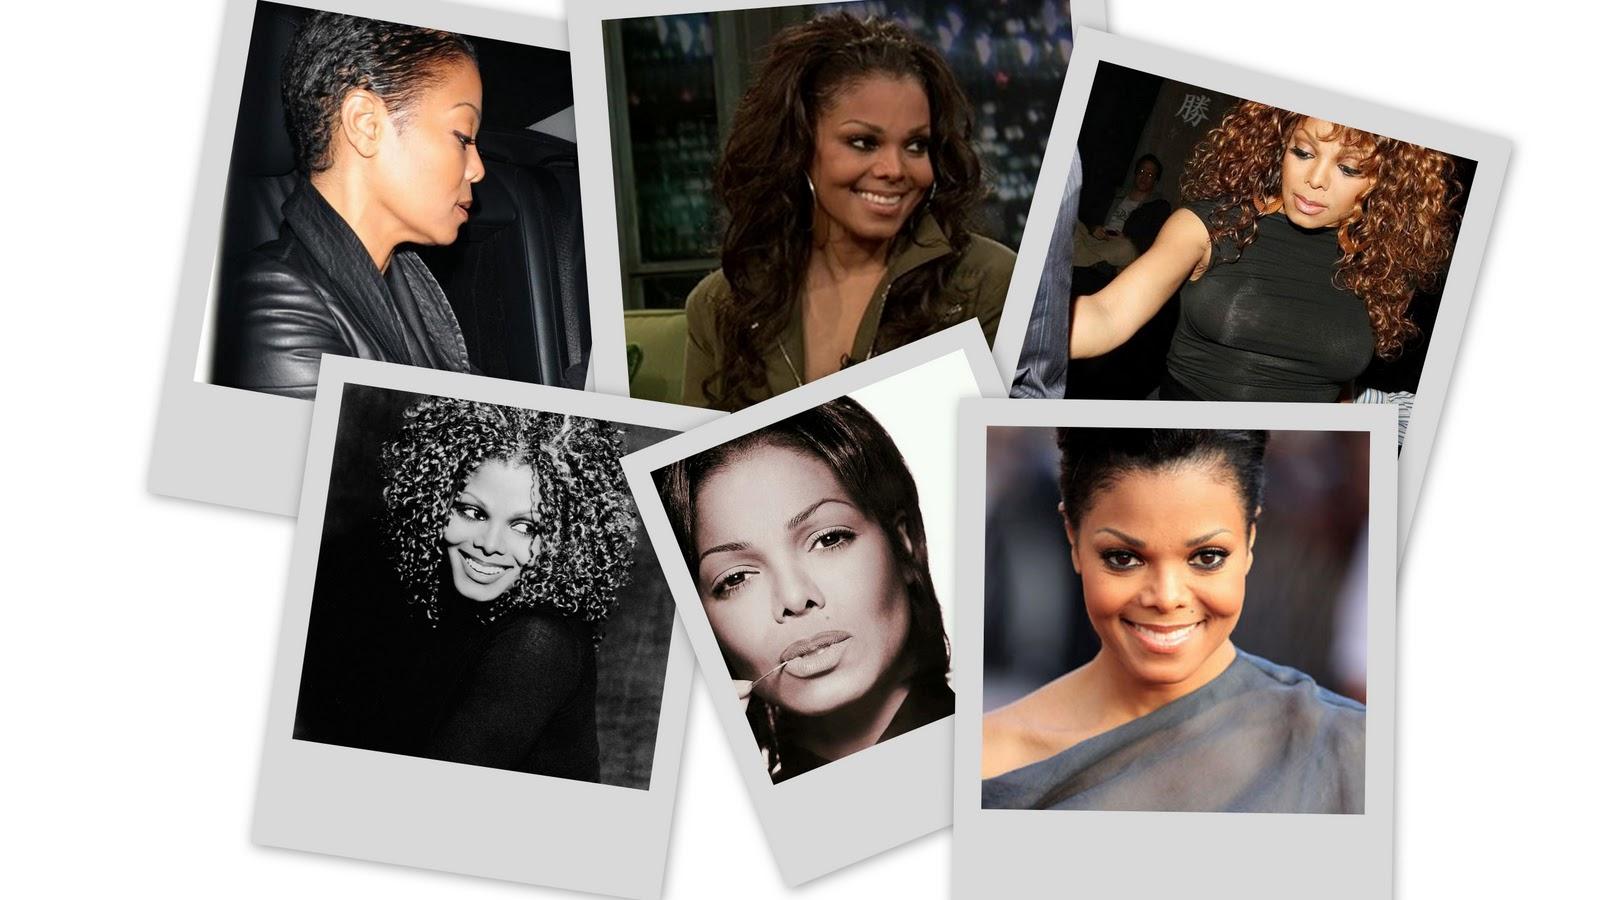 http://2.bp.blogspot.com/_KdzN5WaqkKo/TRI0_vey3xI/AAAAAAAAAFw/M57cU_vOQjs/s1600/Janet+Jackson.jpg